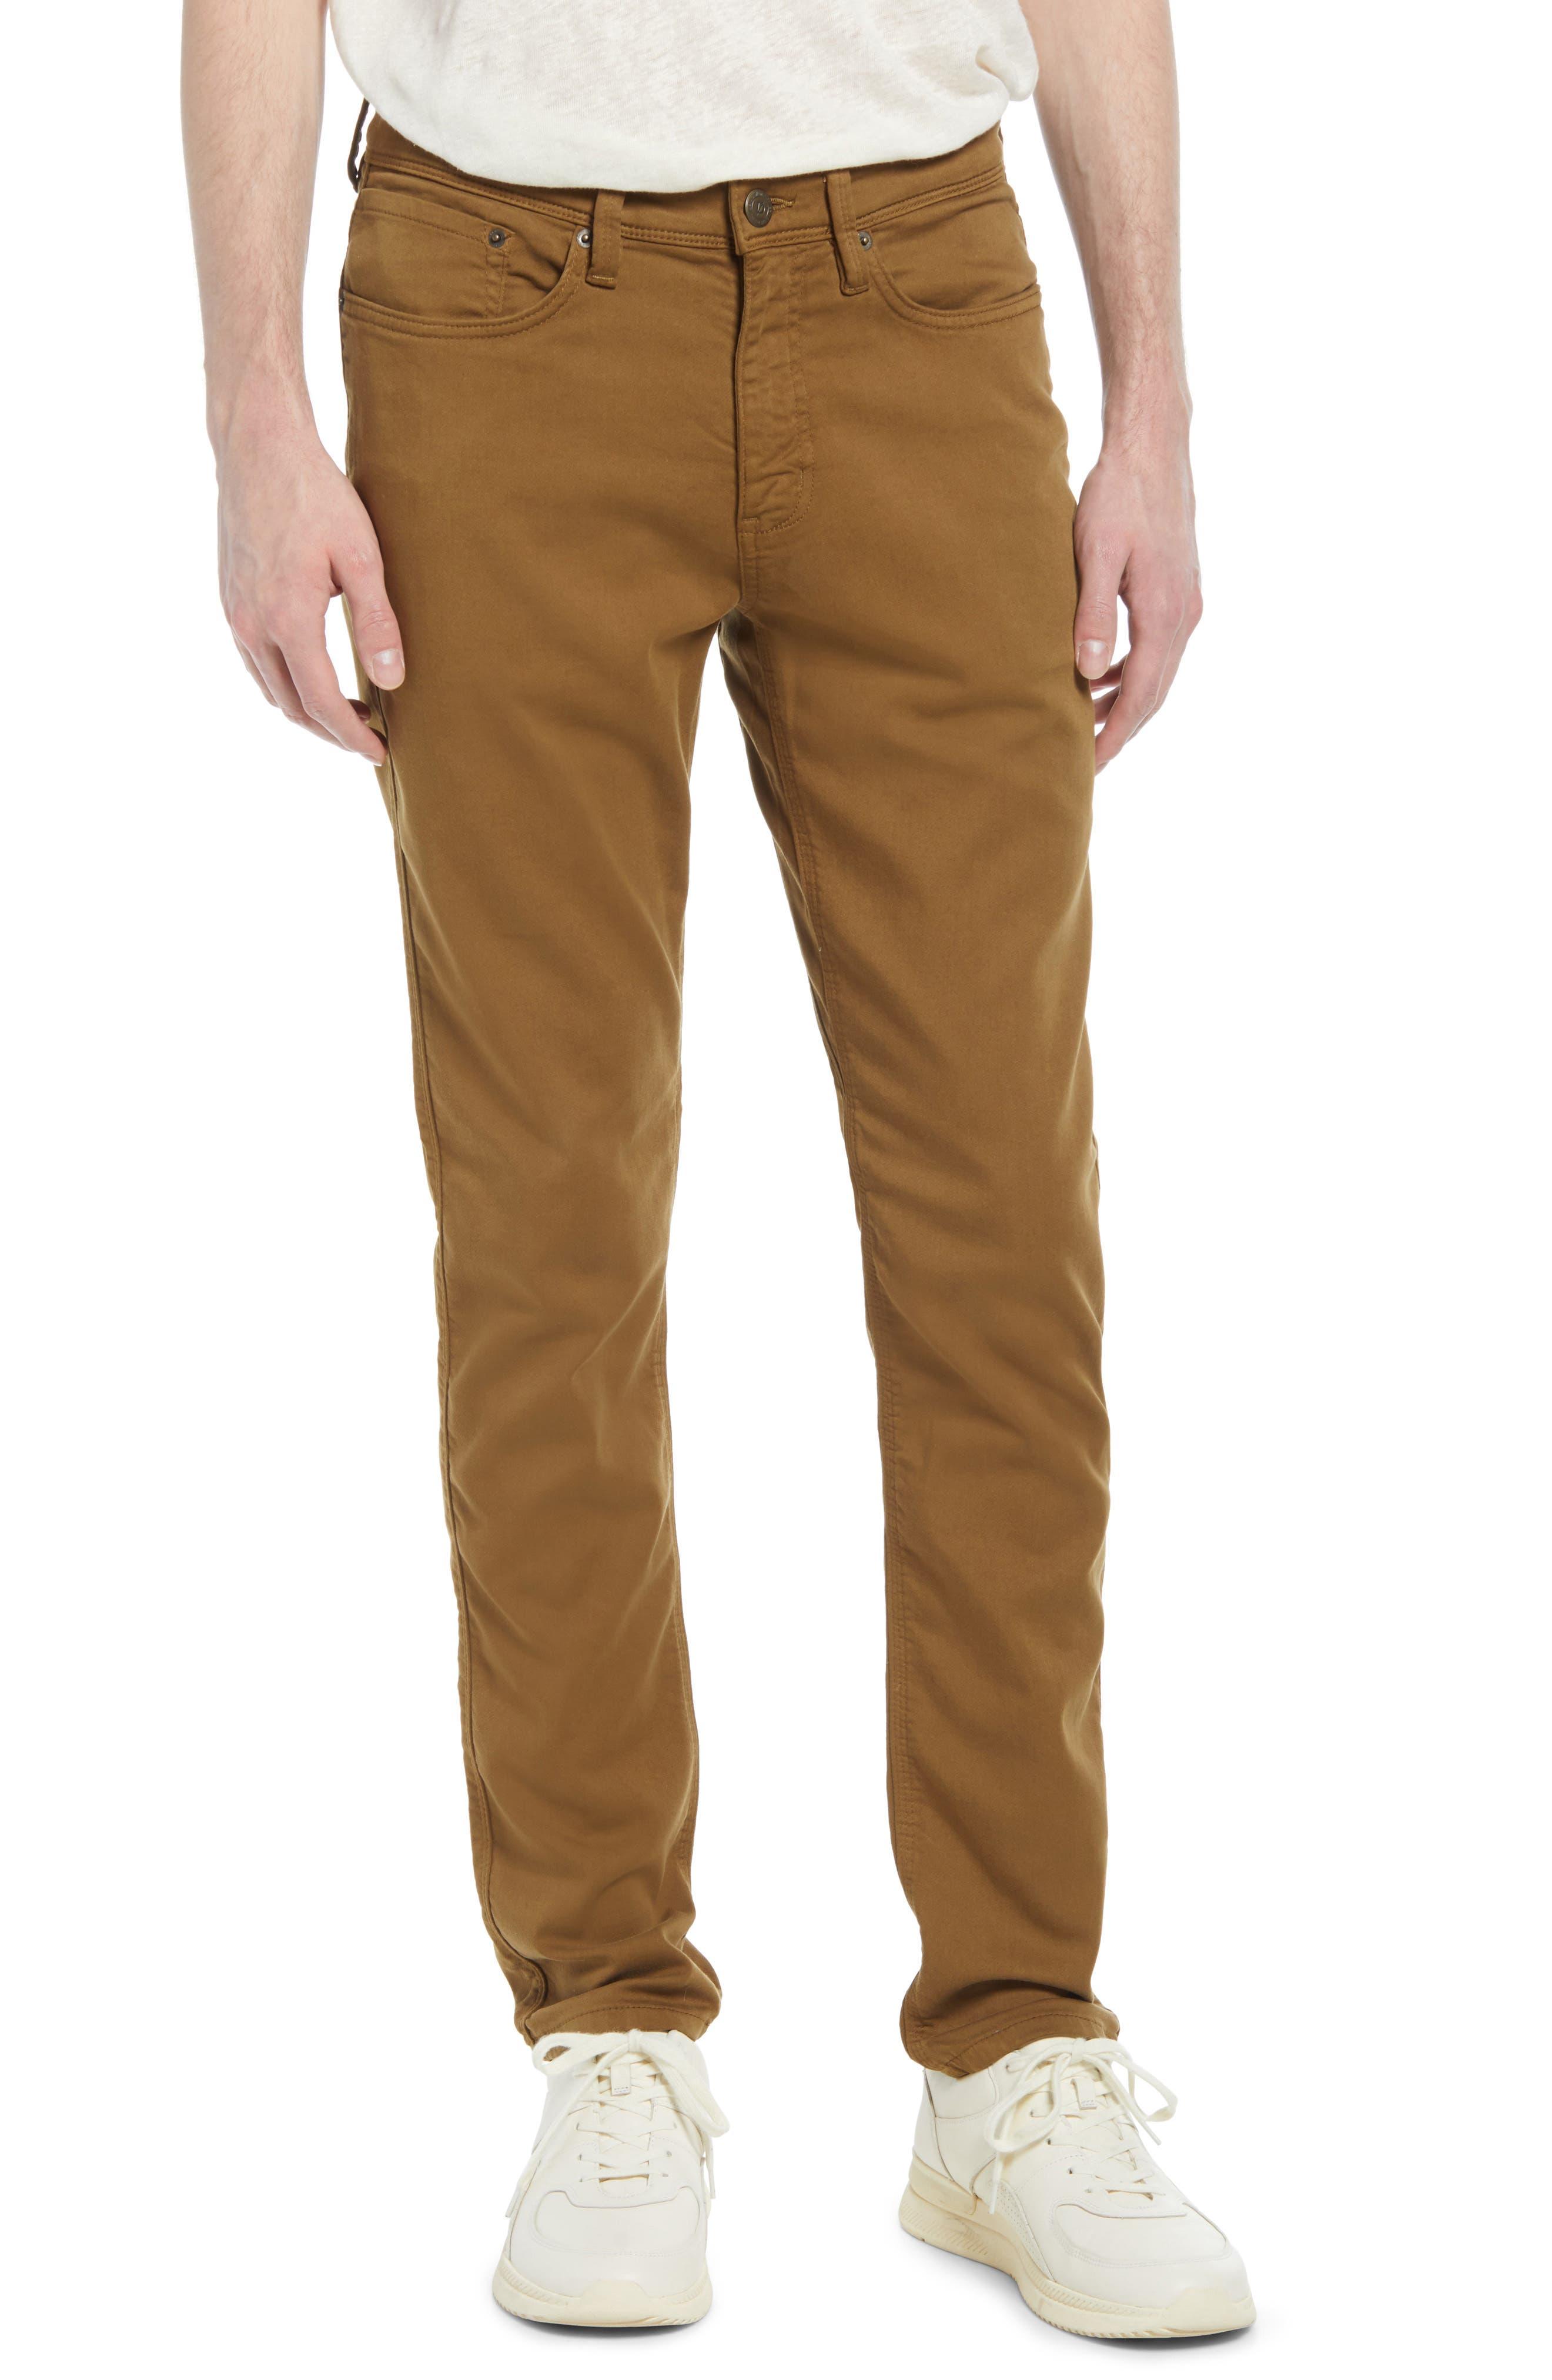 Men's No Sweat Stretch Cotton Blend Five Pocket Pants